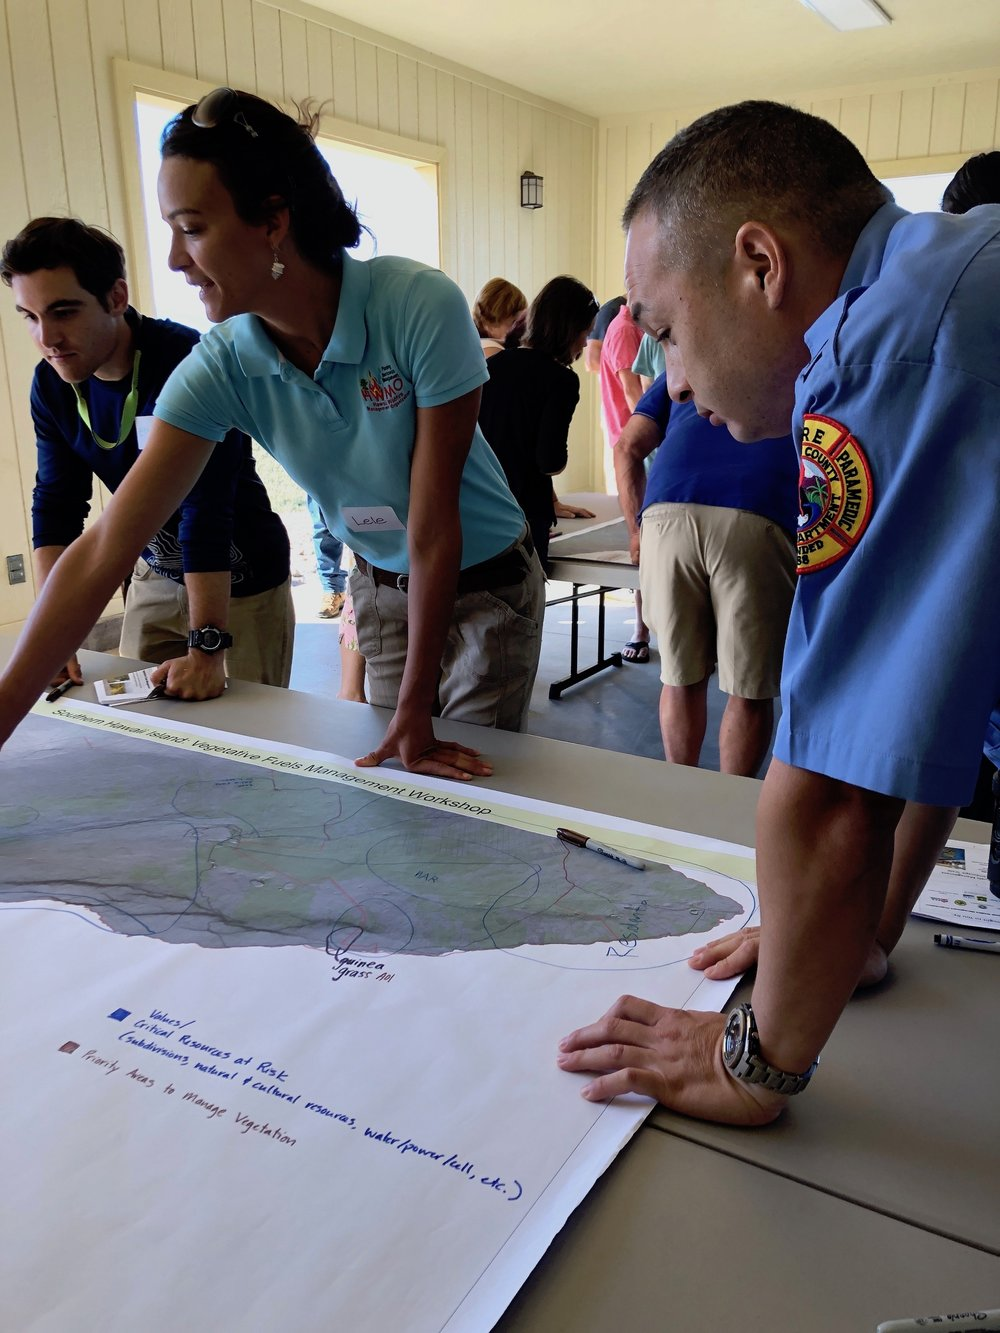 Hawaii Island Kailapa Vegetative Fuels Management Collaborative Action Planning Workshop_2_26_2019_35.jpg